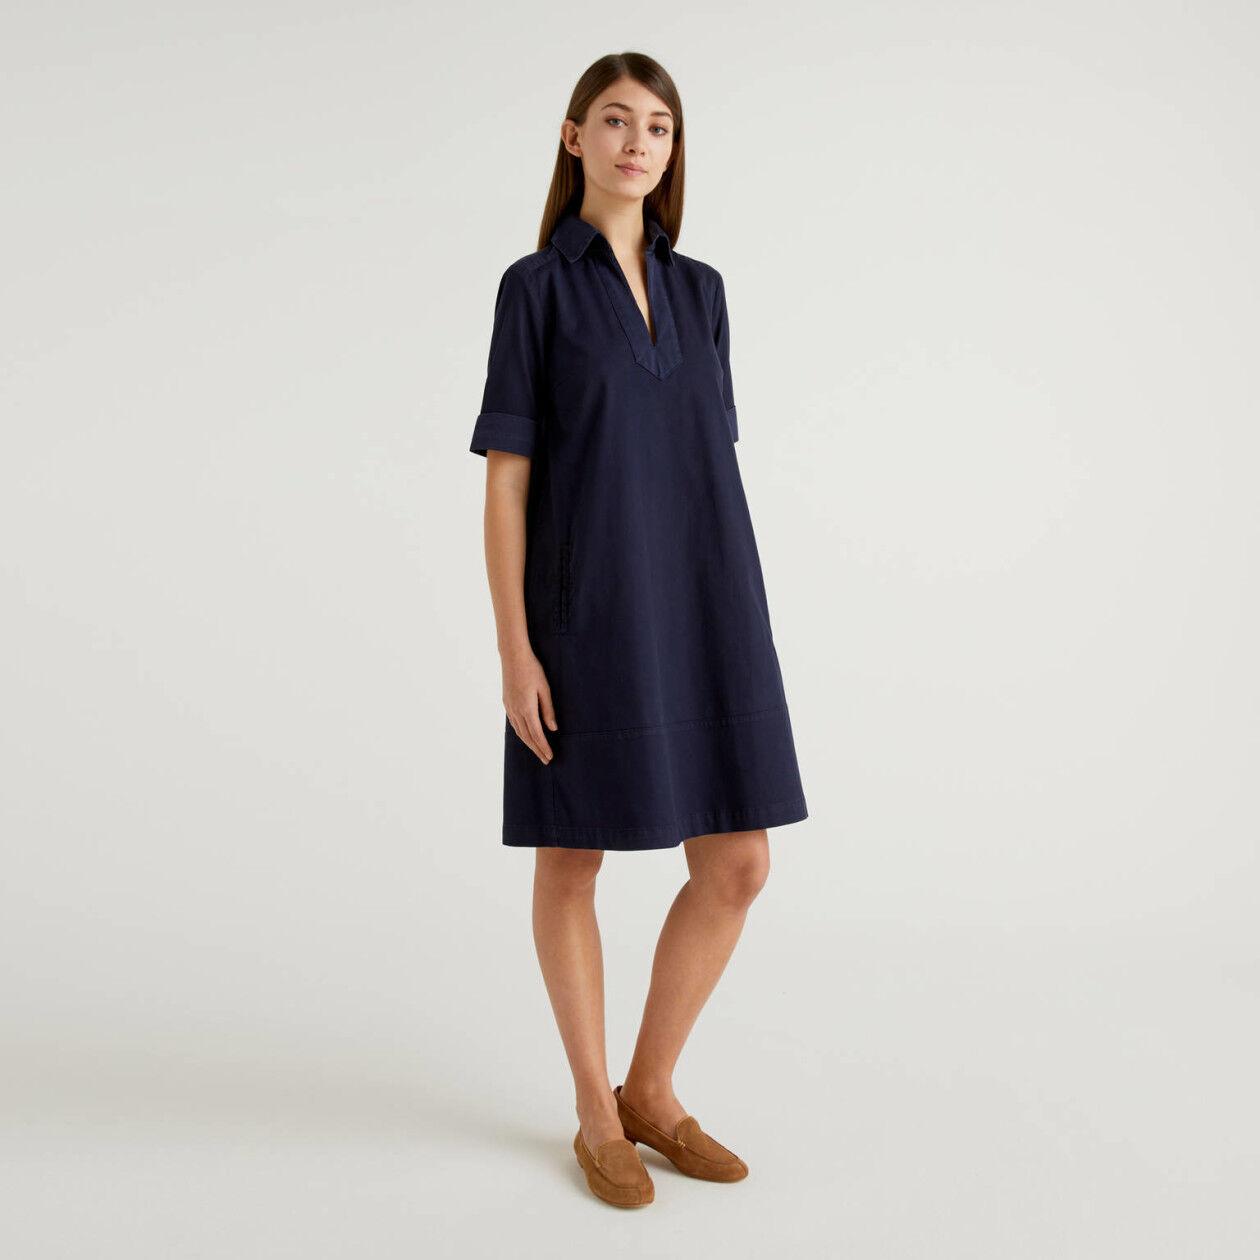 Robe évasée en coton stretch